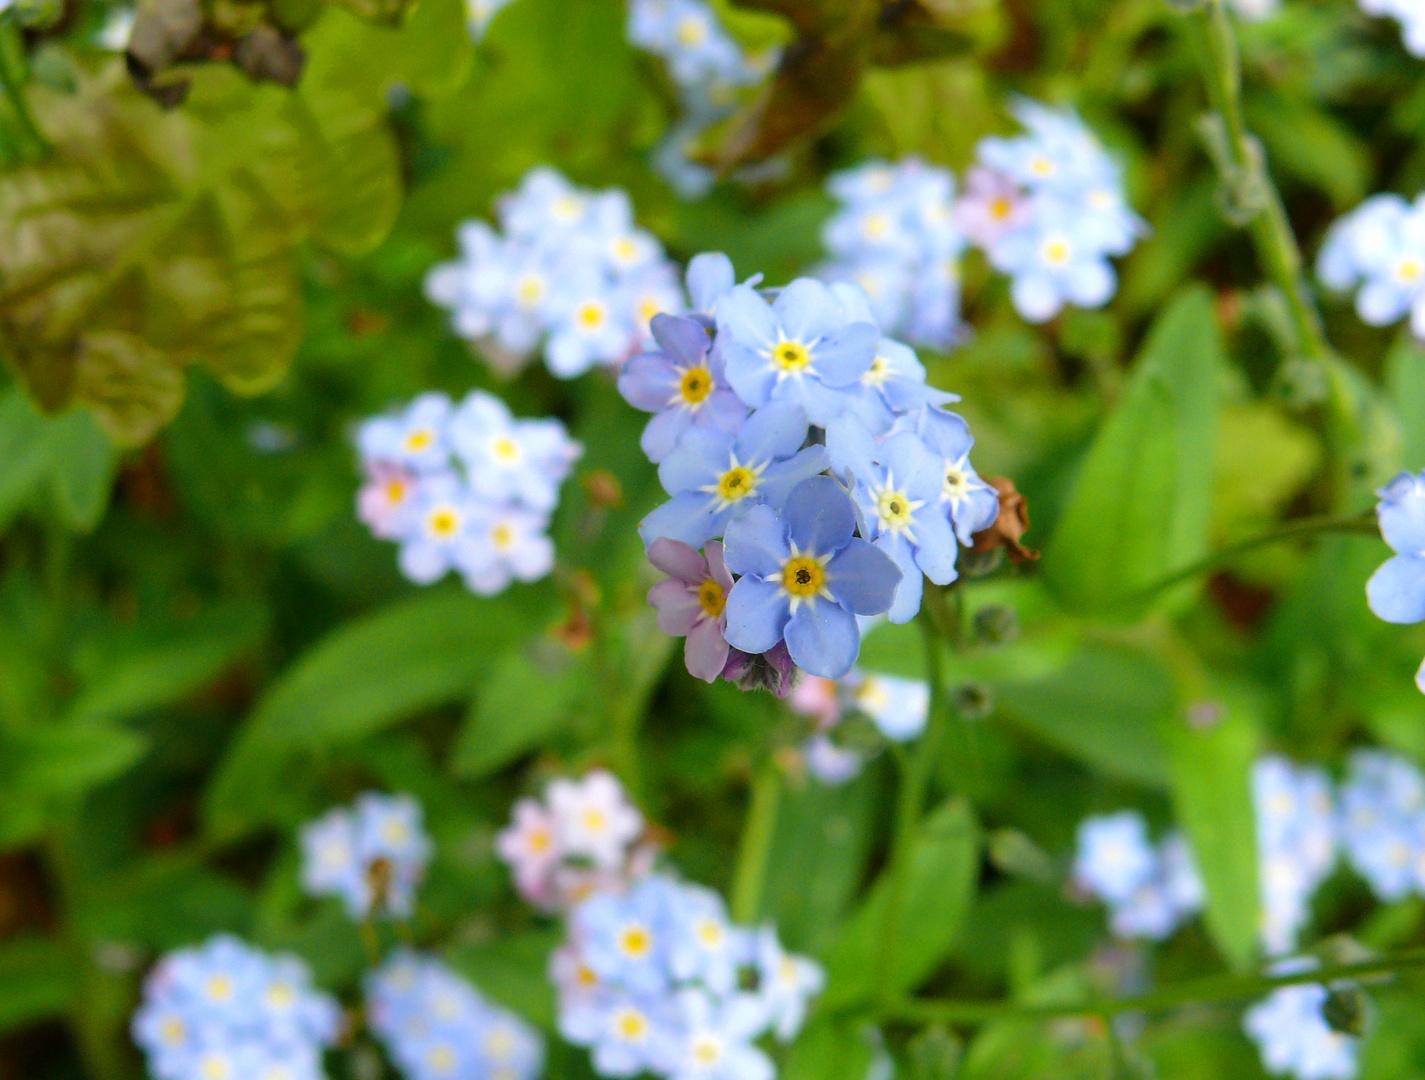 Zarte Blüten am Waldrand 2